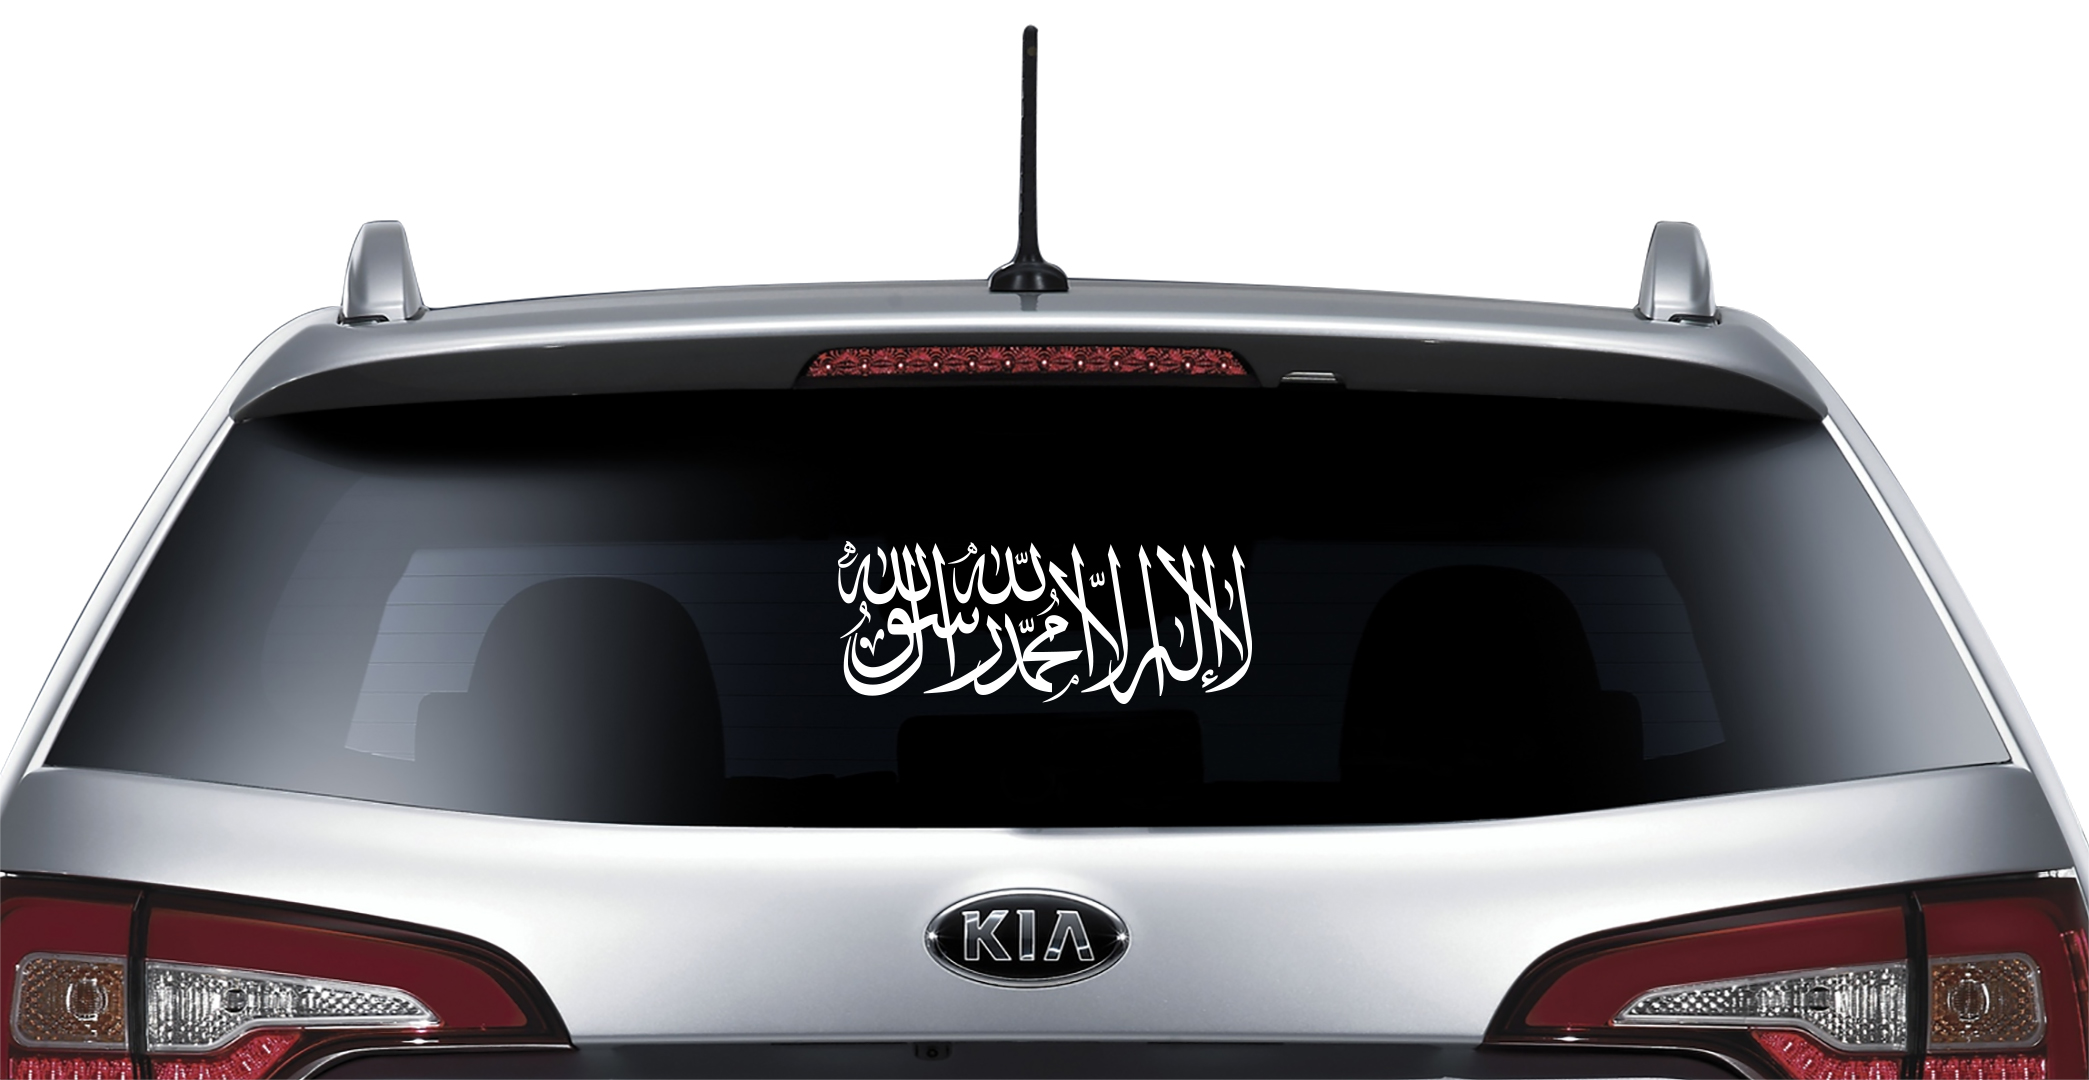 islamische autoaufkleber heckscheibenaufkleber 25 cm. Black Bedroom Furniture Sets. Home Design Ideas